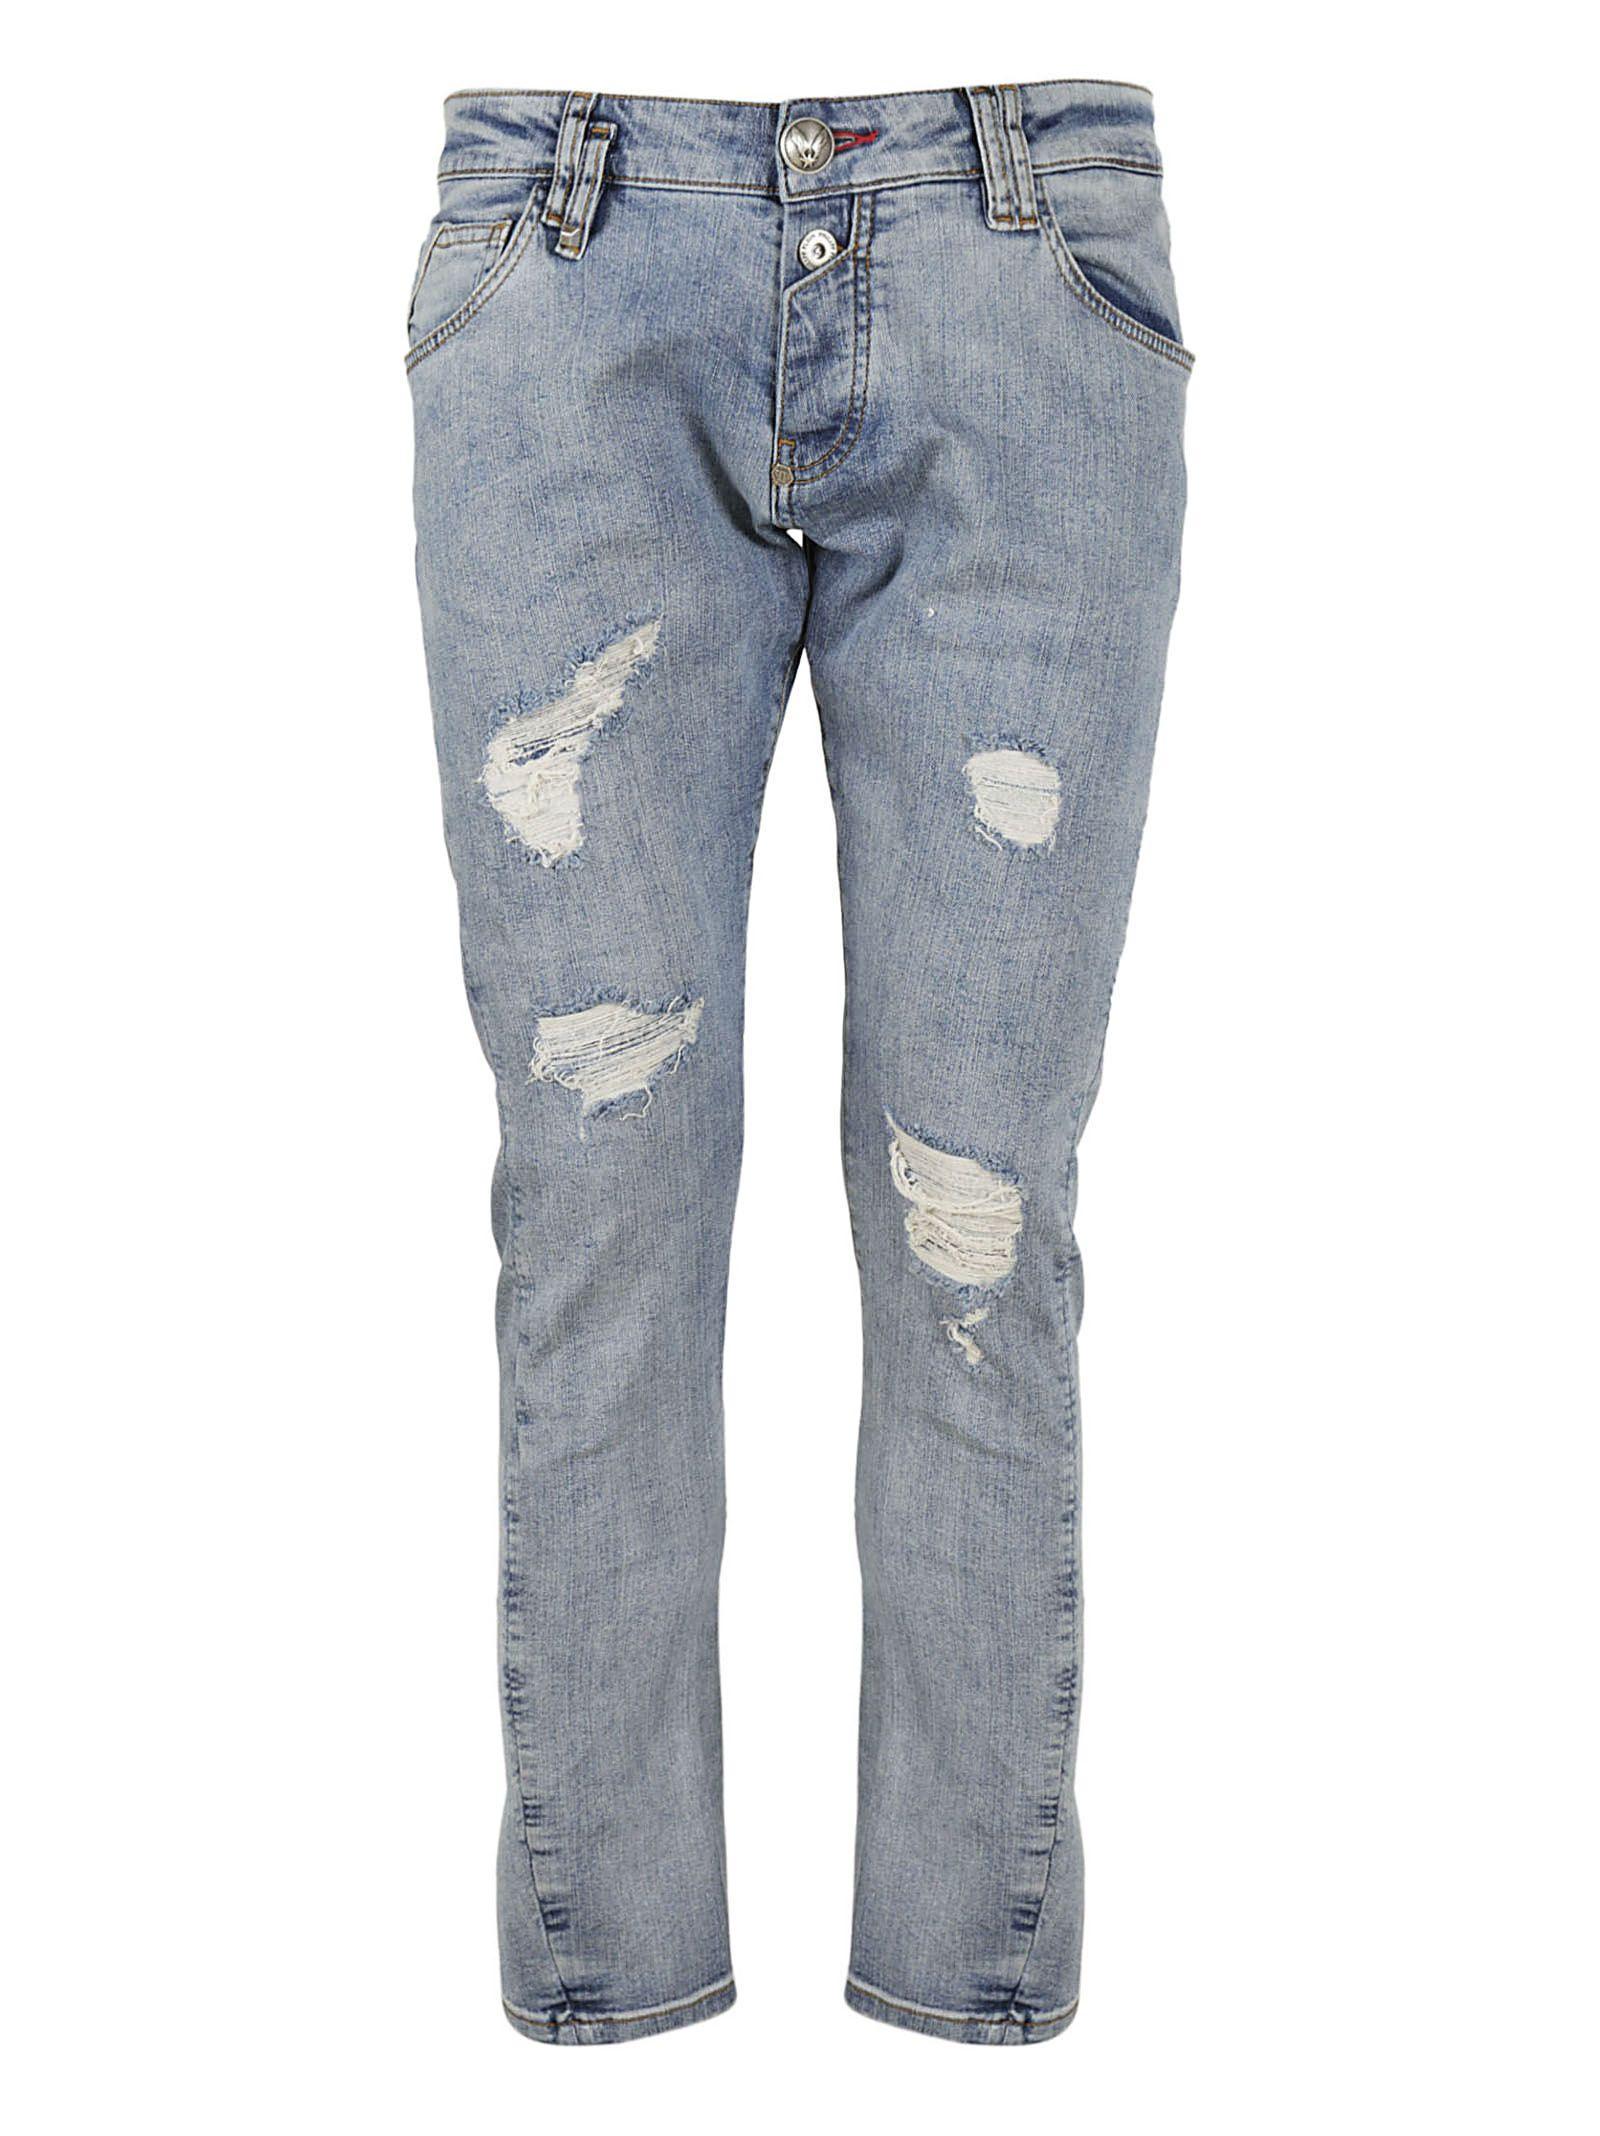 Fool jeans - Blue Philipp Plein S02dCa1